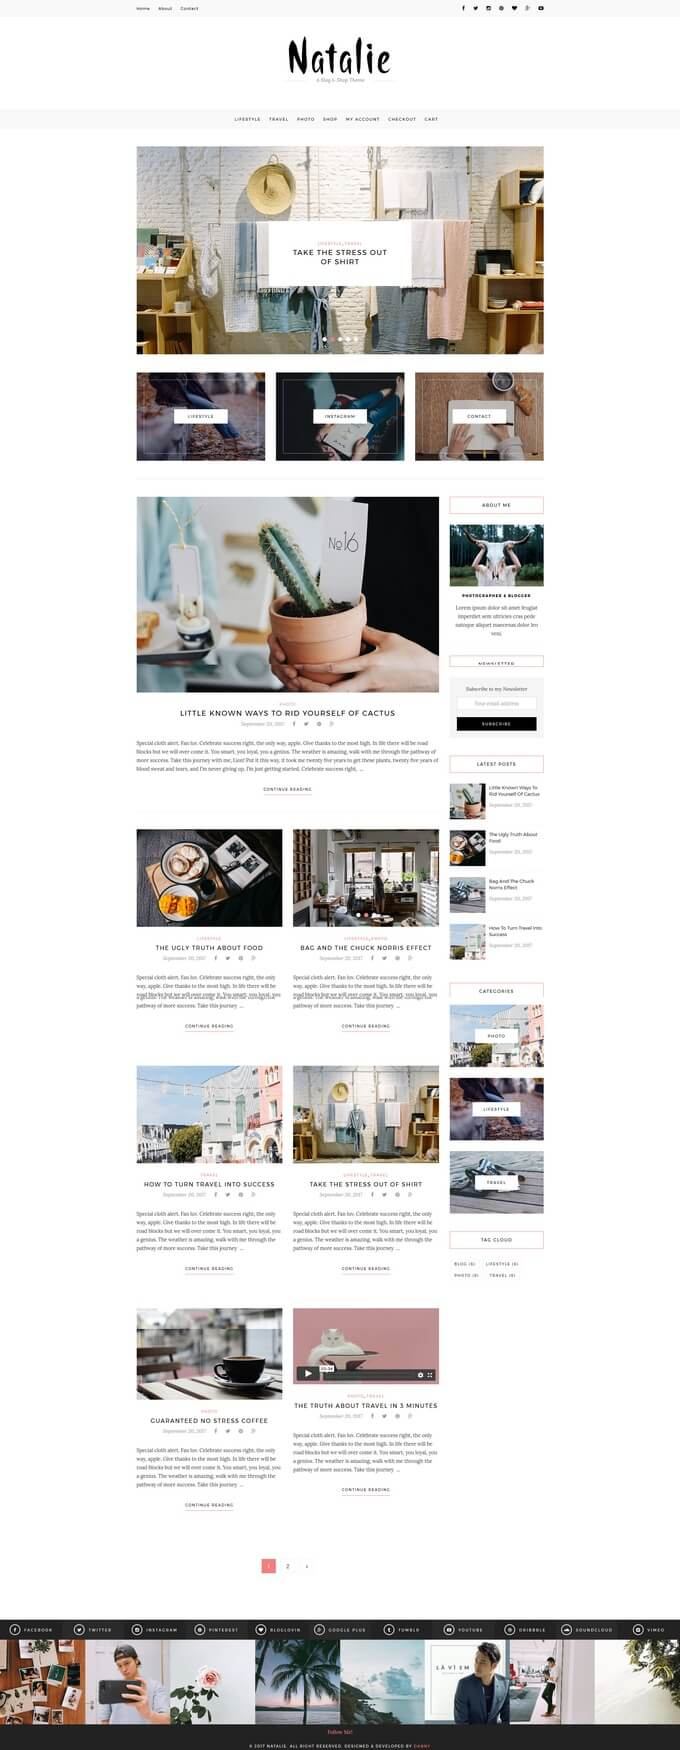 Natalie Theme WP Design